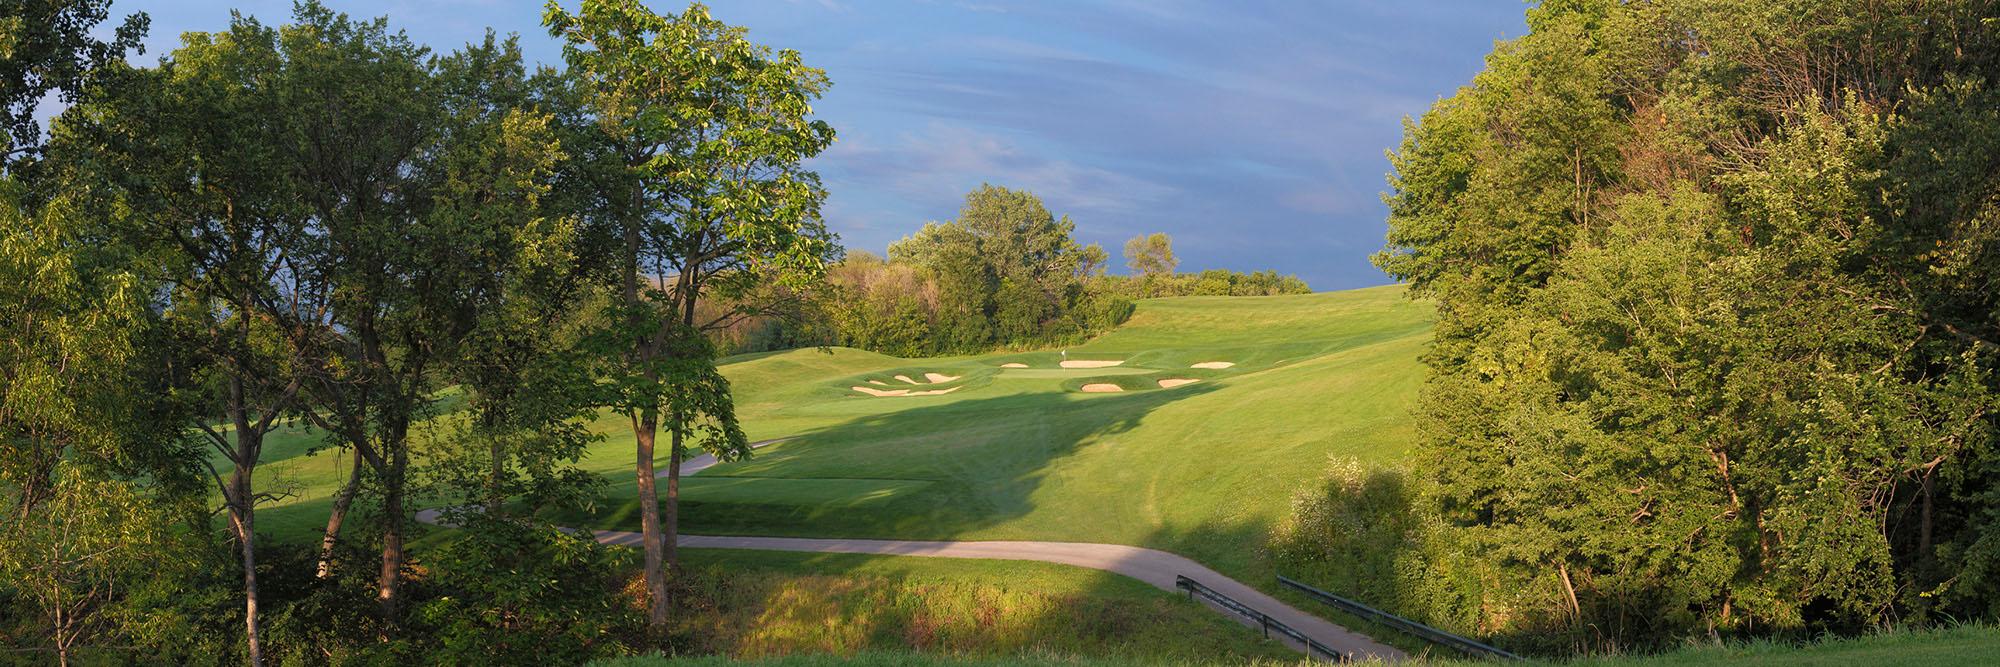 Golf Course Image - Cog Hill 4 No. 14